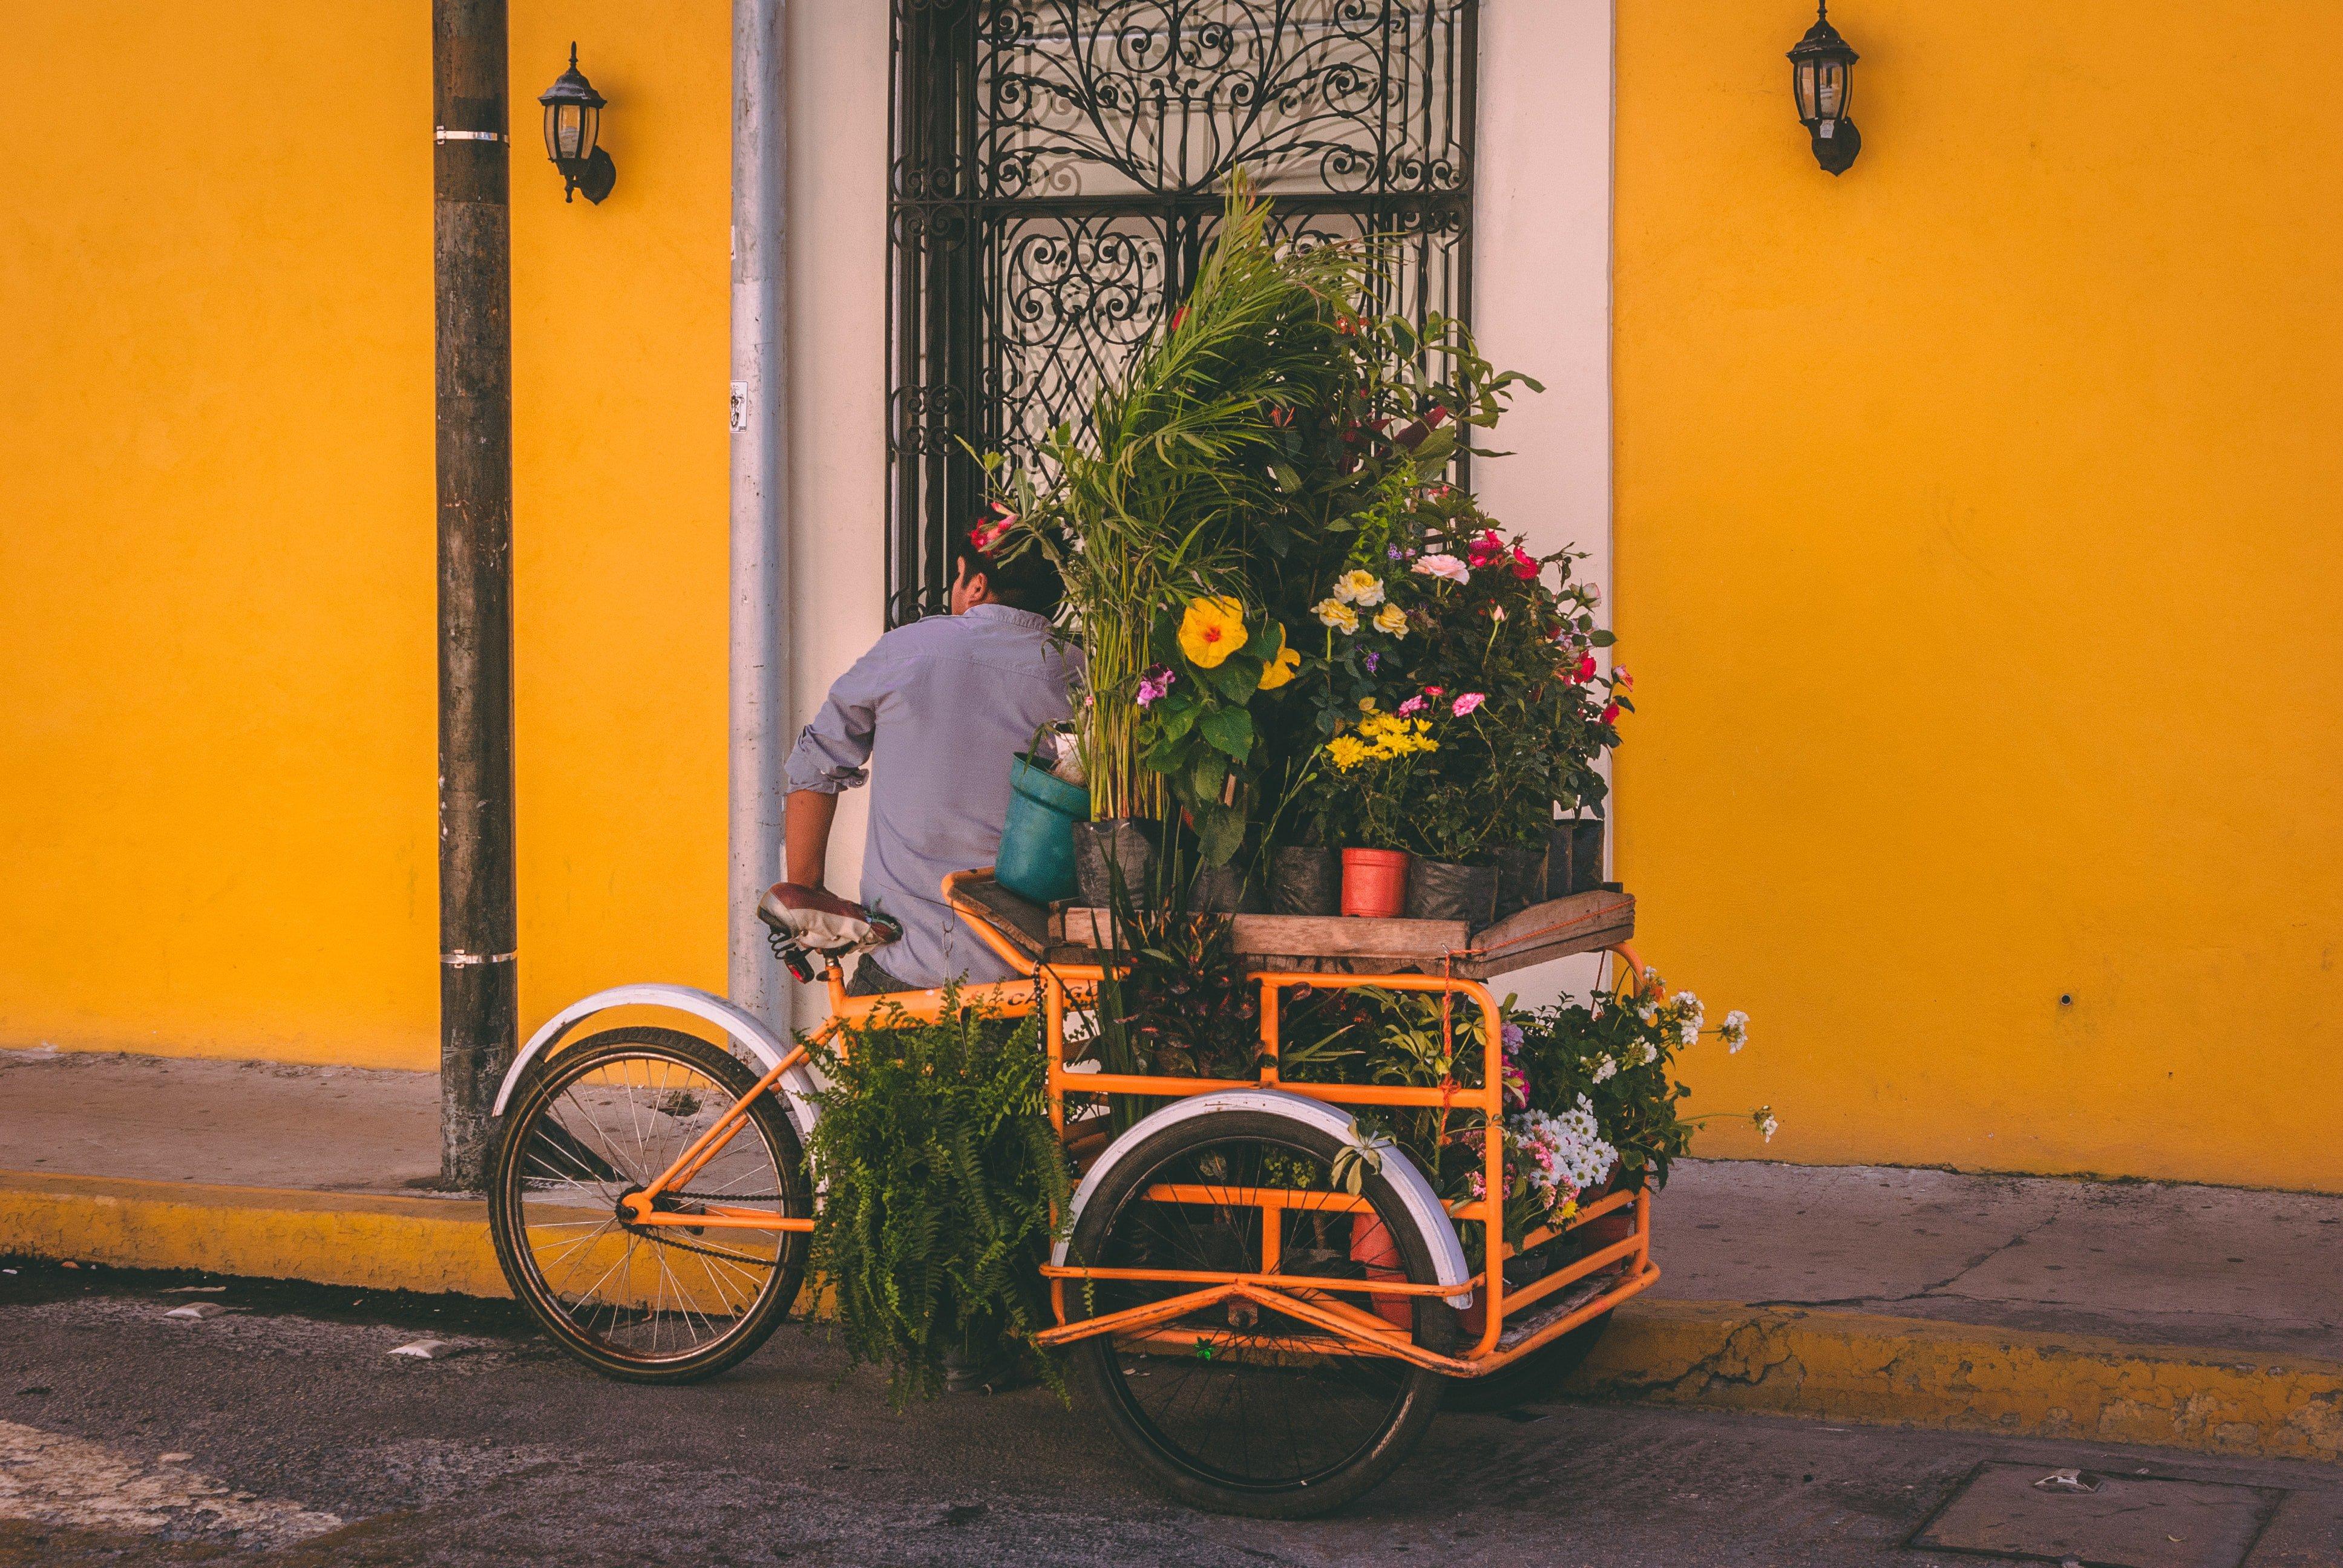 Mexico City Local